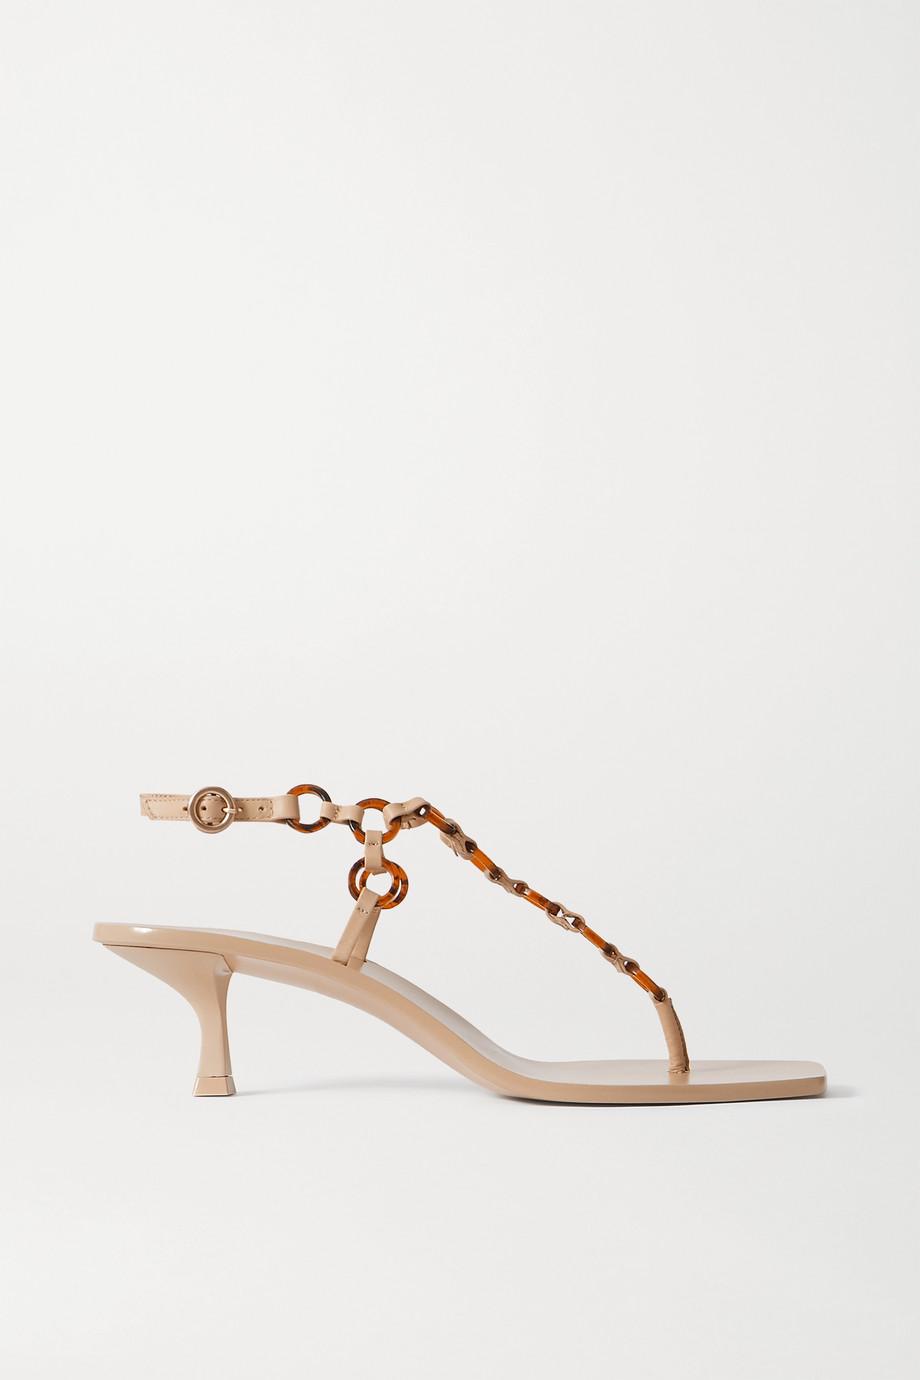 Cult Gaia Caitlyn 带缀饰皮革凉鞋